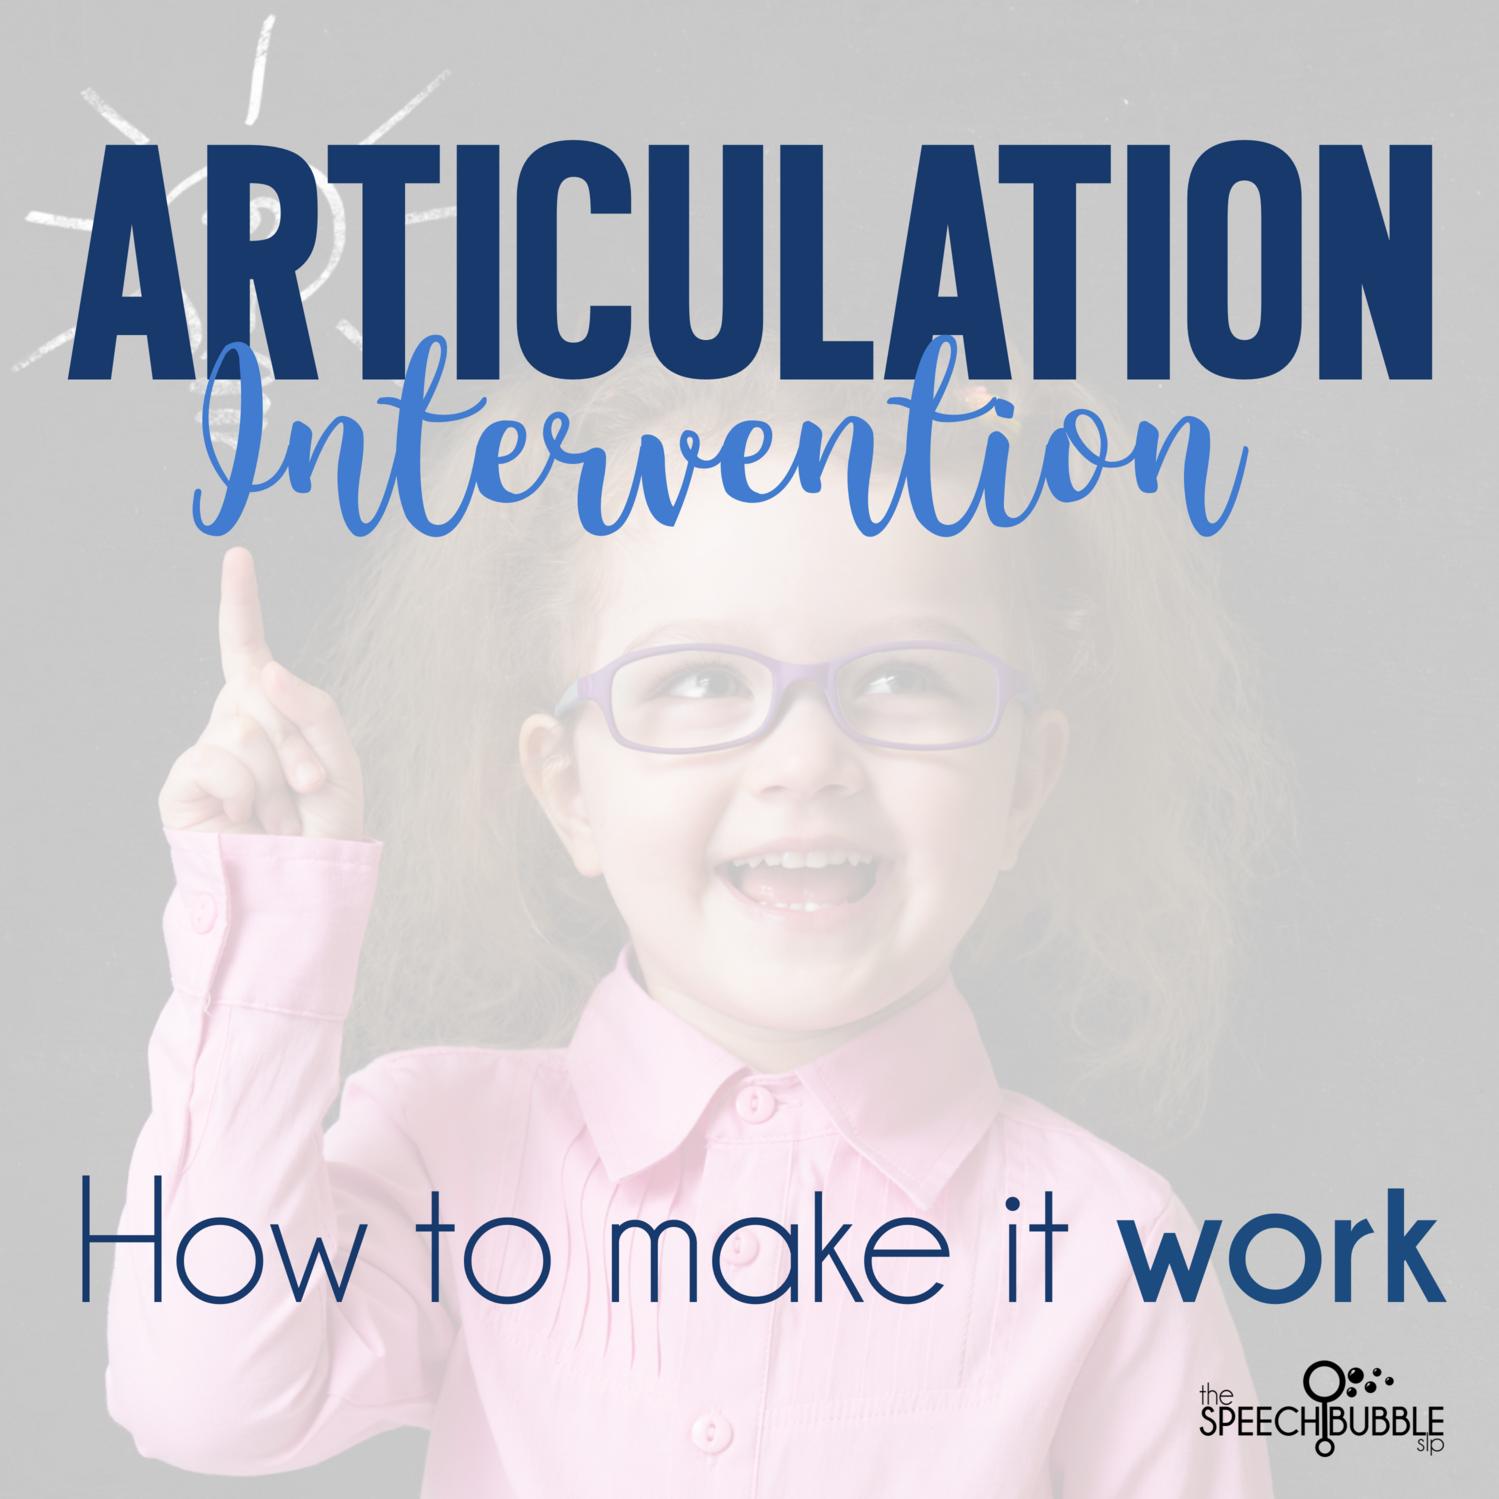 Articulation Intervention: How to make it work